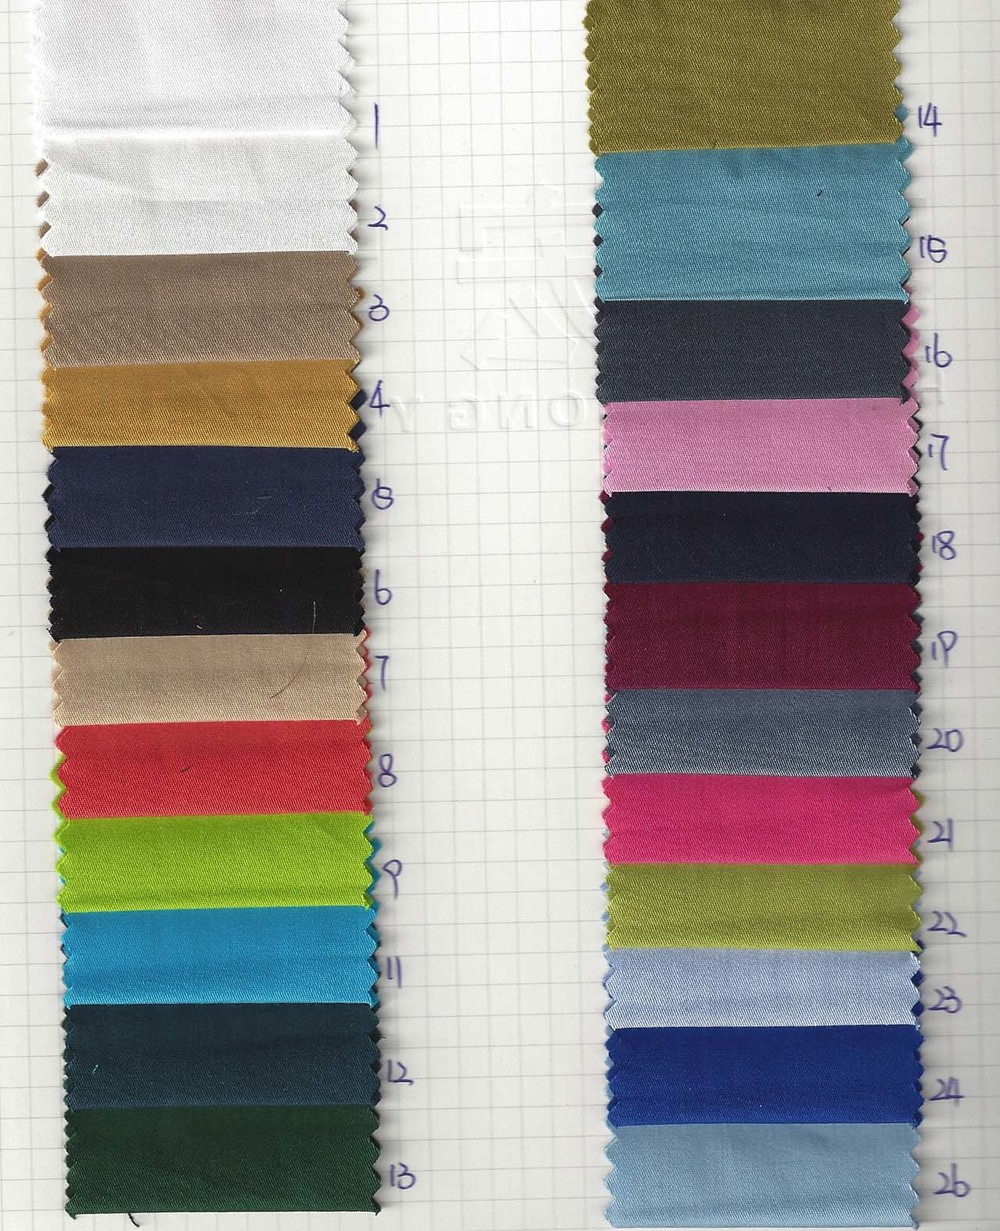 Hong Yu Textile C305.jpg